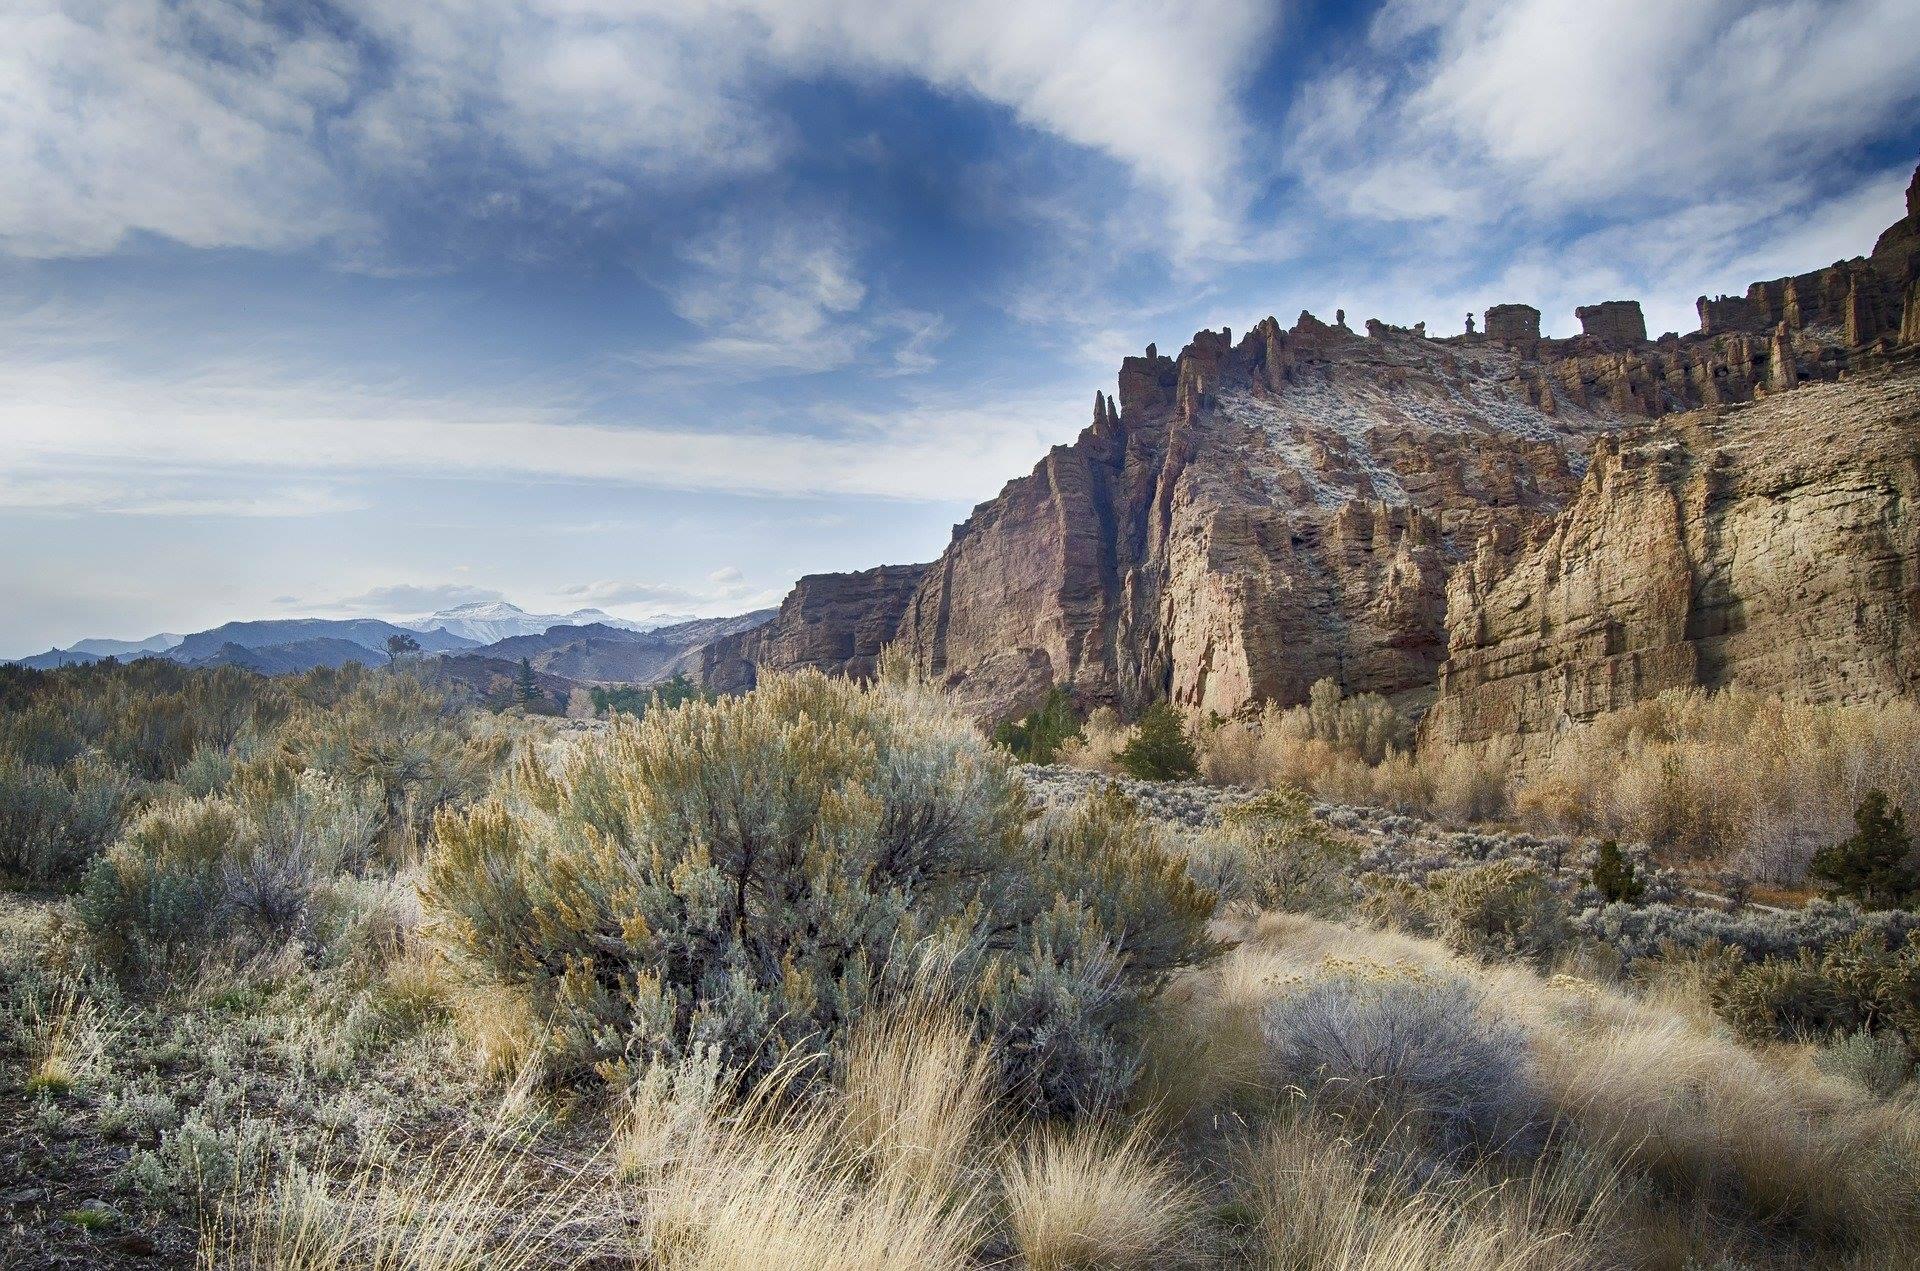 yellowstone national park mountains grass